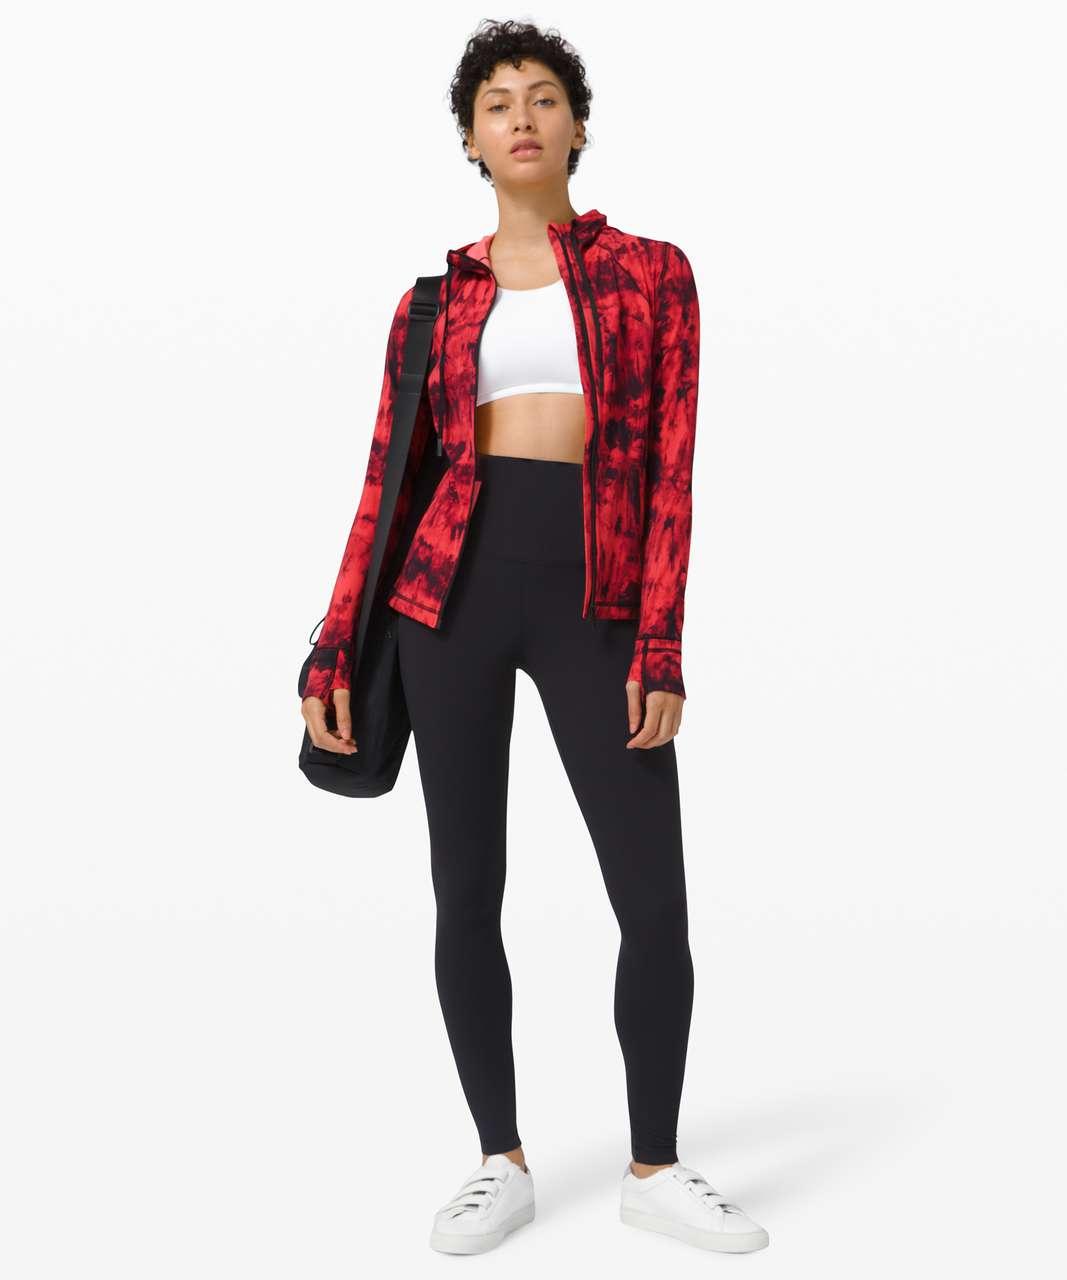 Lululemon Hooded Define Jacket Nulu *Game Day - Game Day Red Black Multi